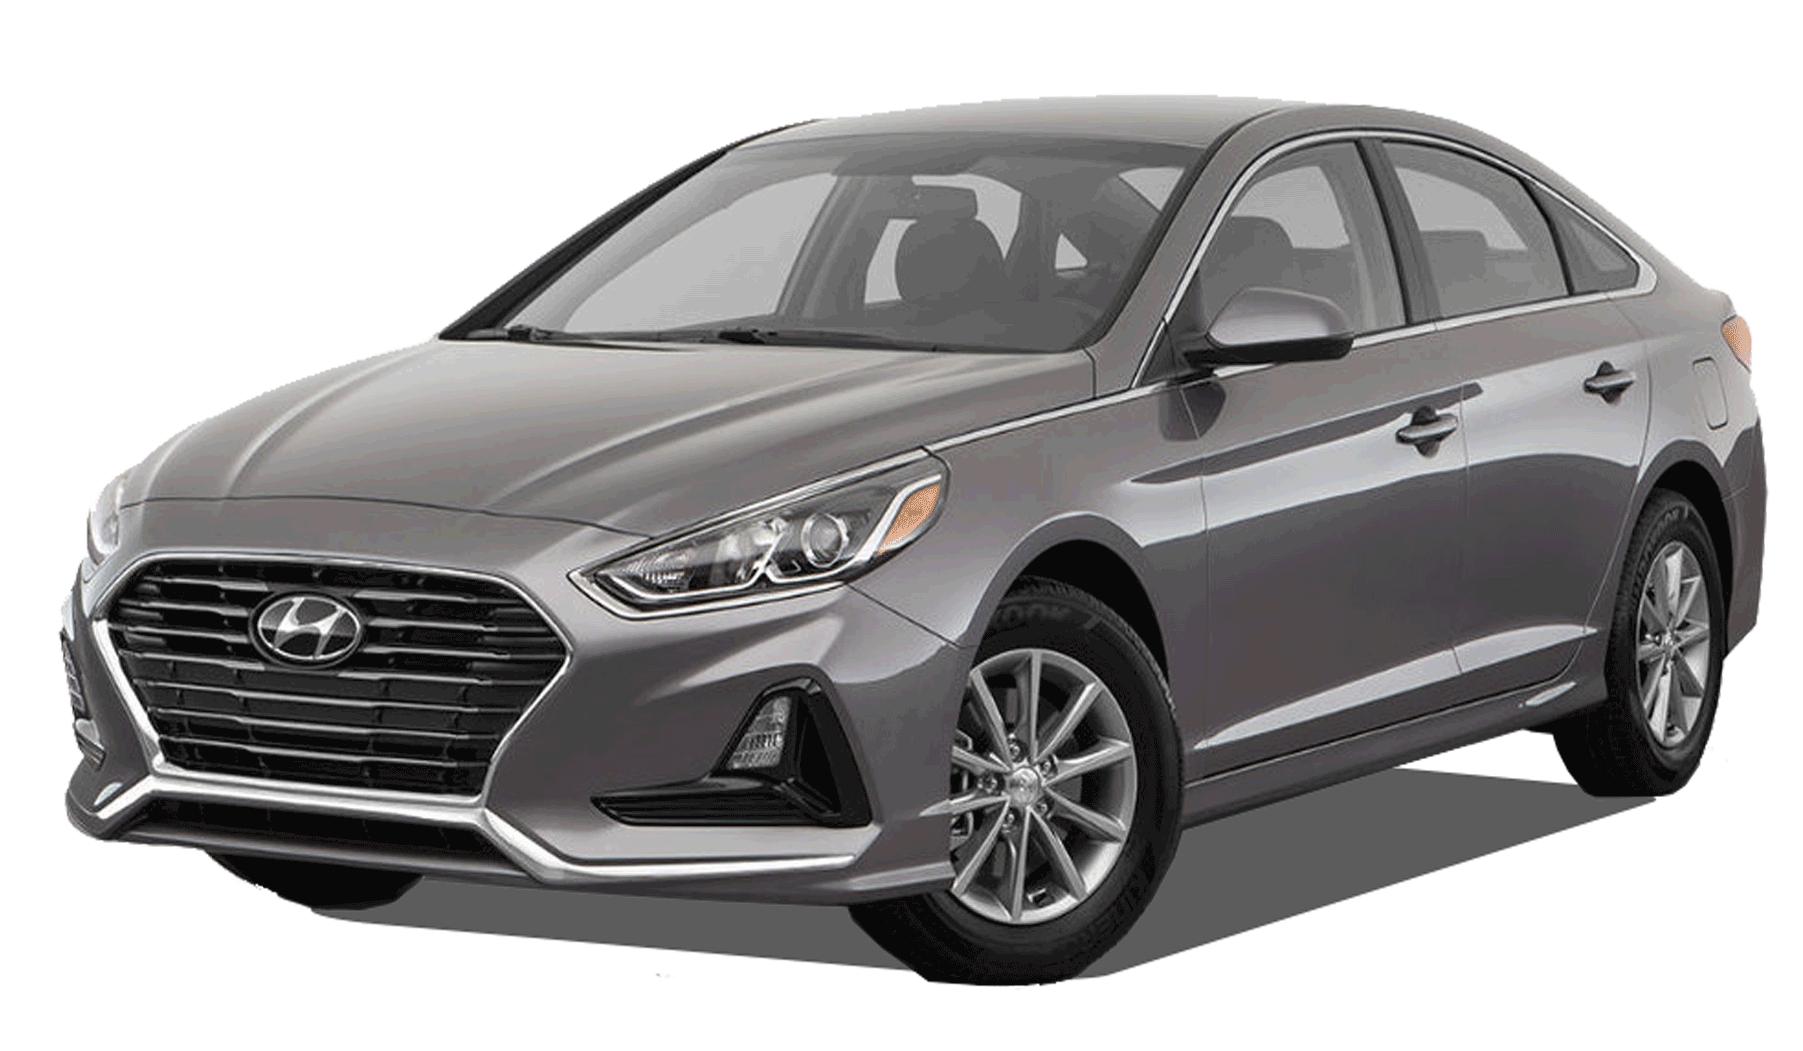 Key Car Rental